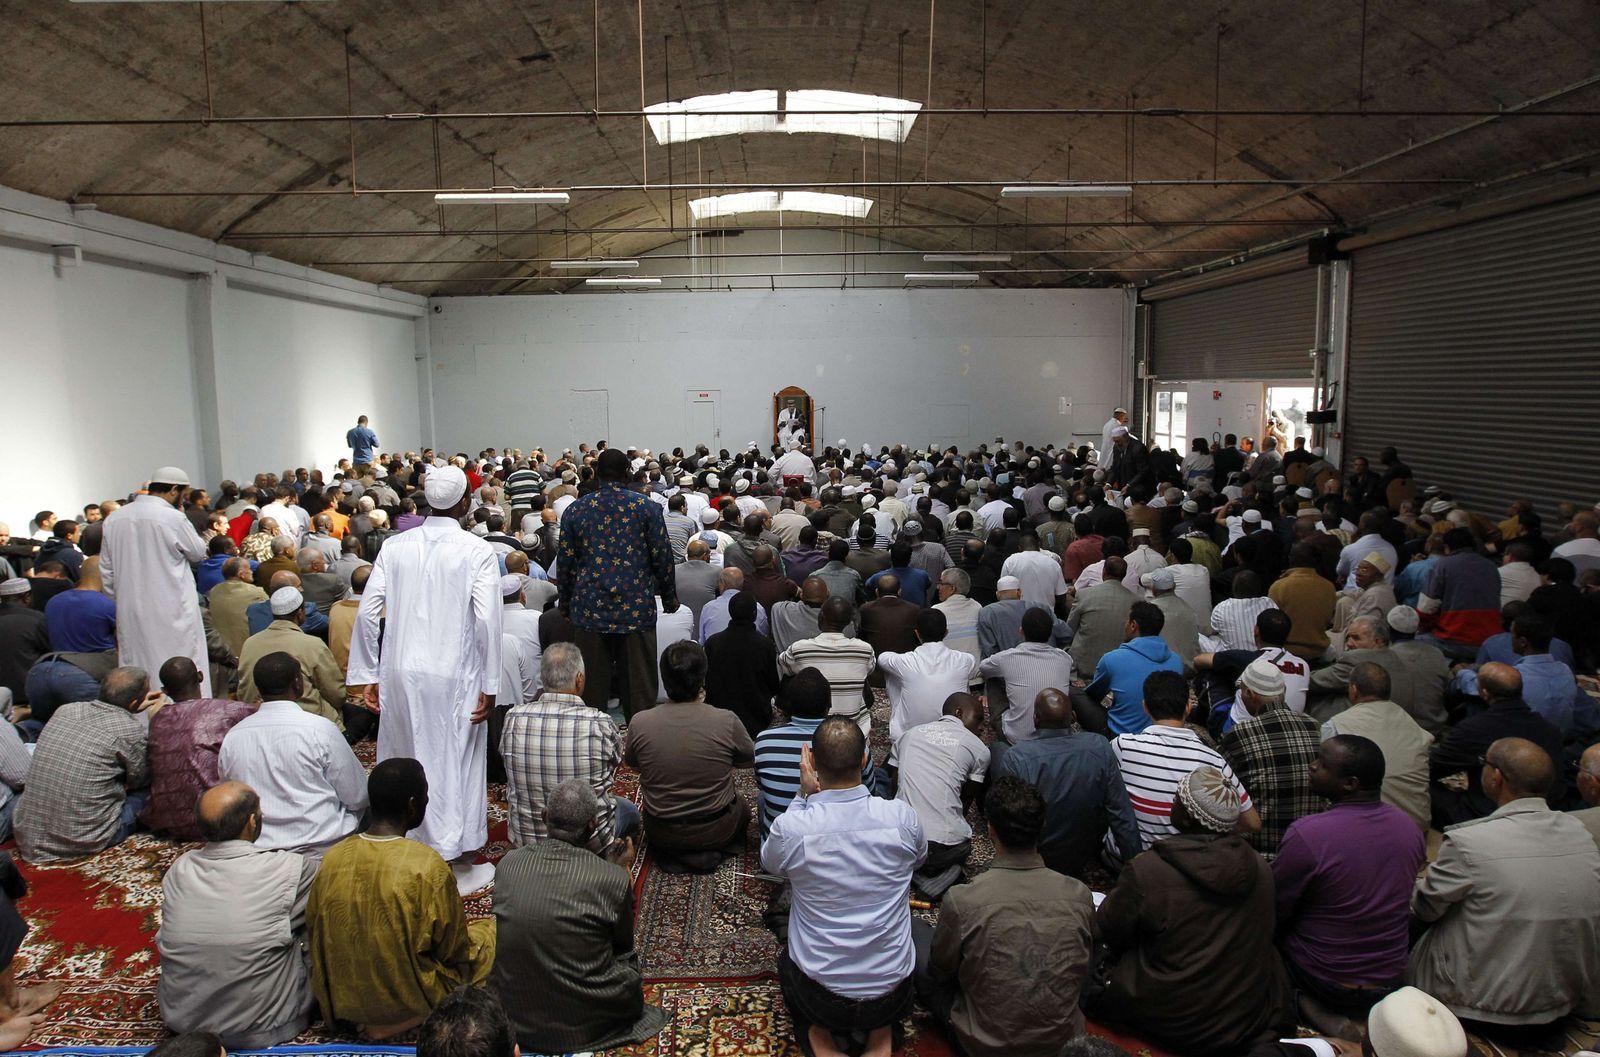 FRANCE-POLITICS-RELIGION-ISLAM-RIGHTS Paris